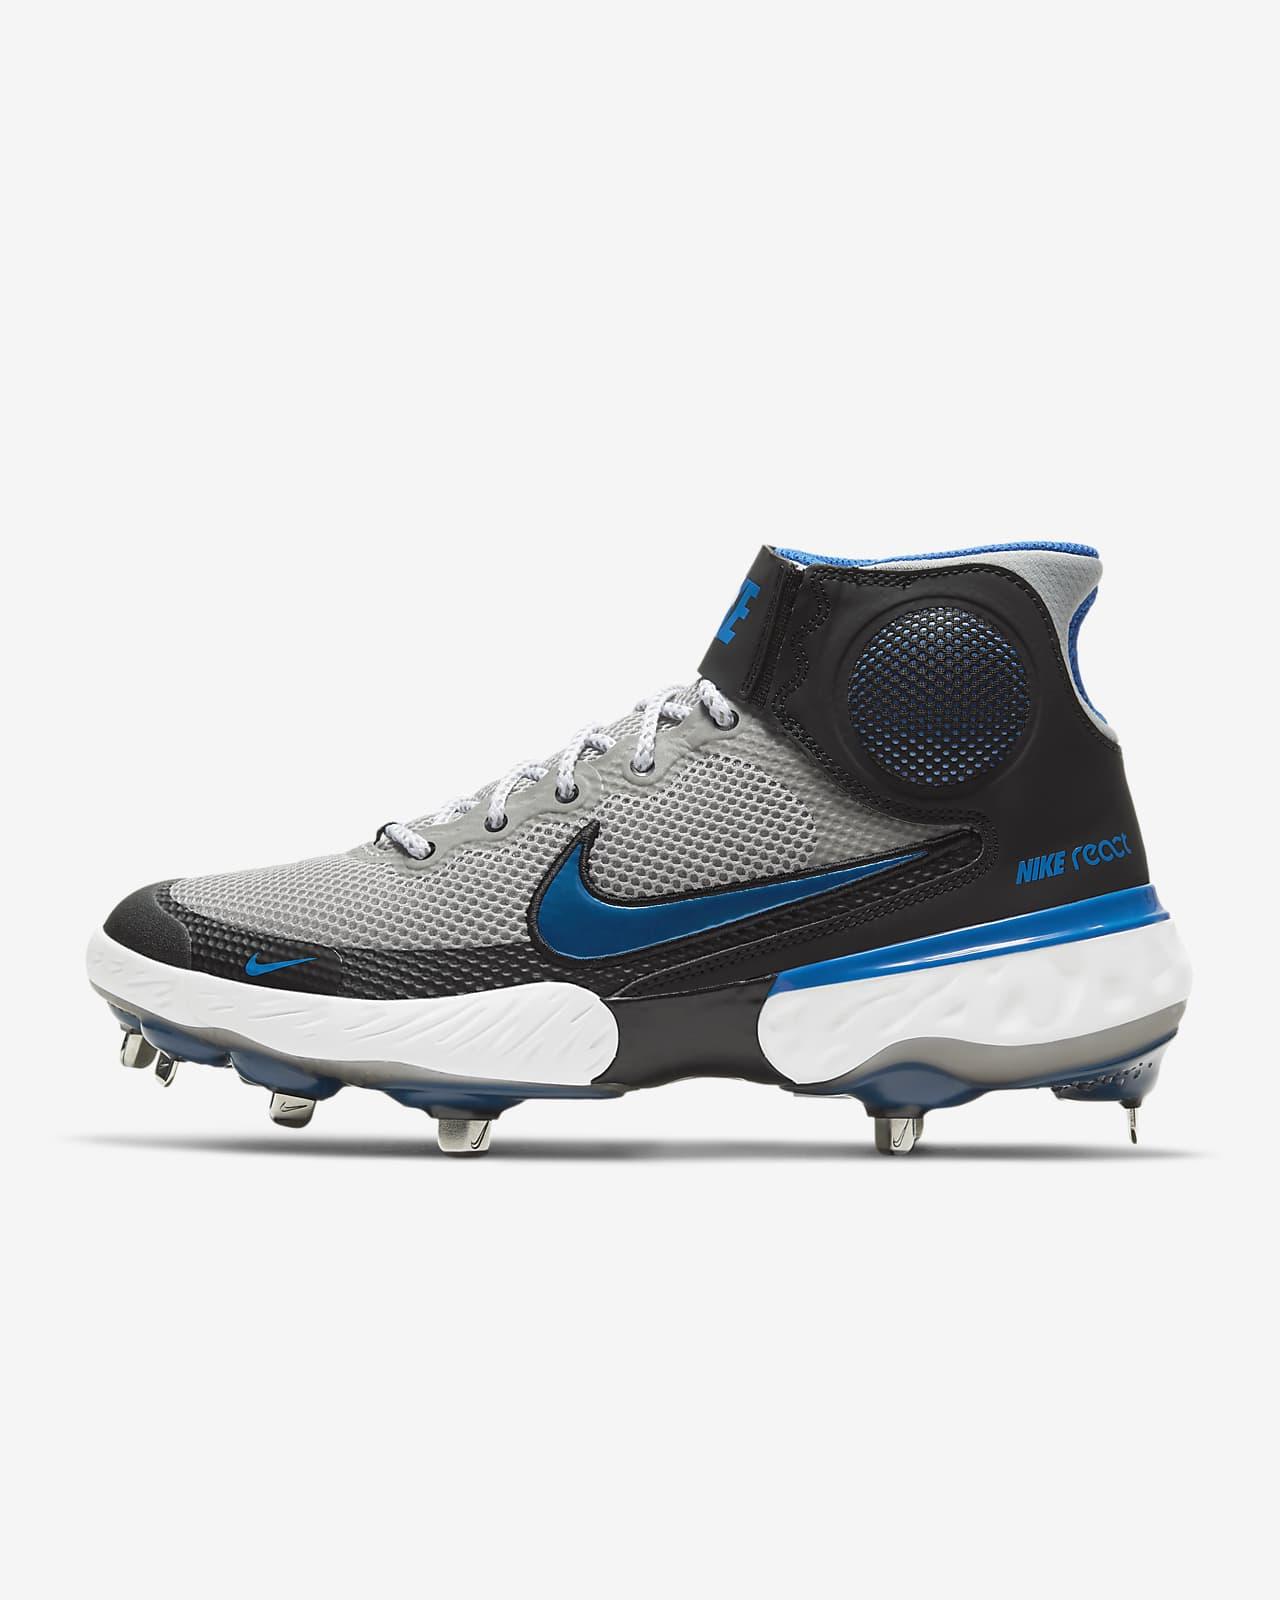 Calzado de béisbol para hombre Nike Alpha Huarache Elite 3 Mid